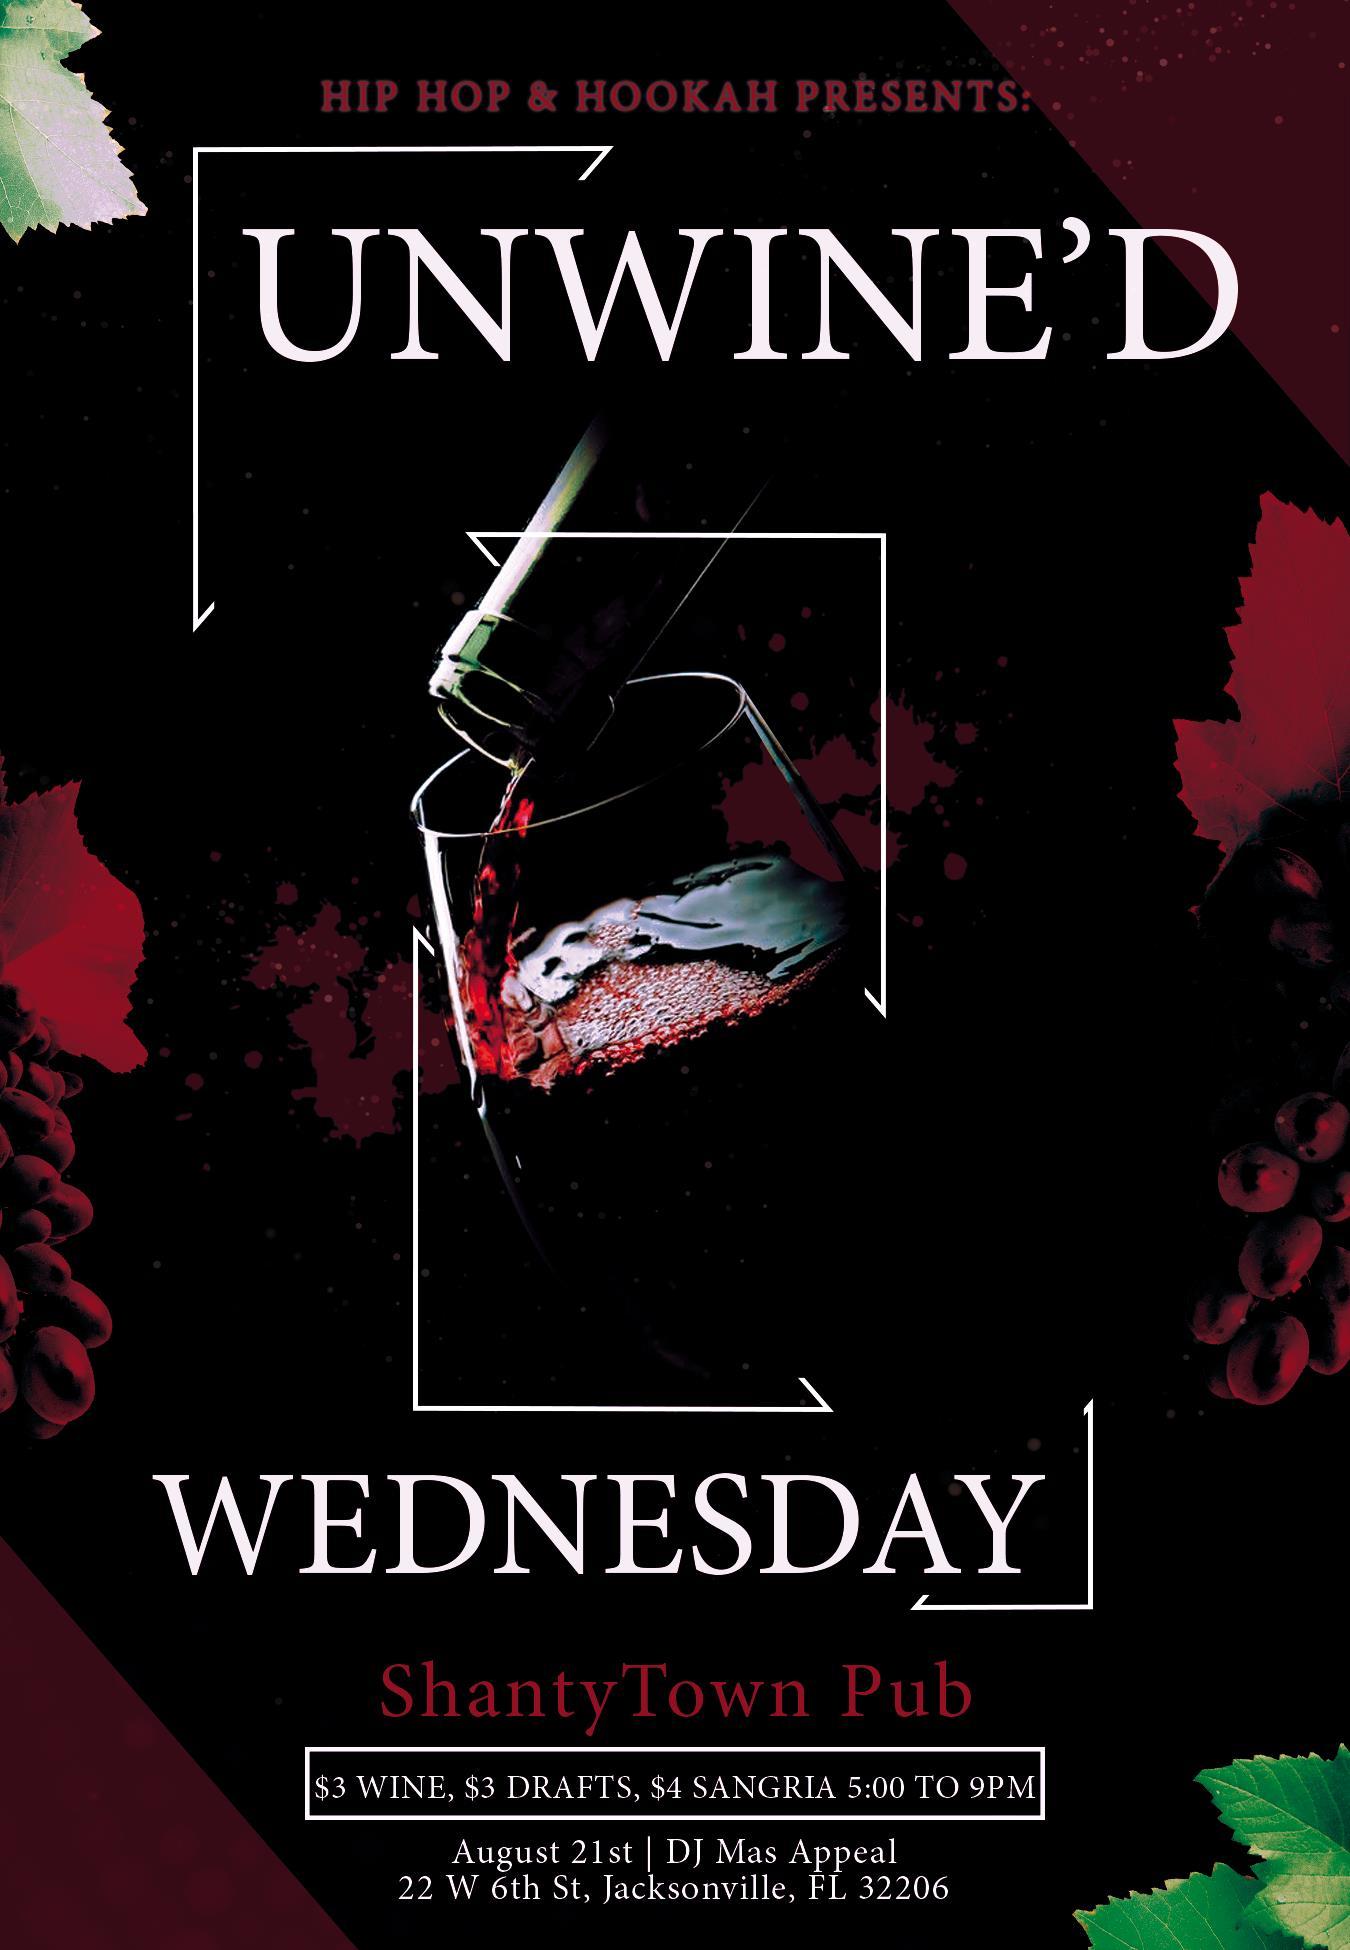 UnWined Wednesday